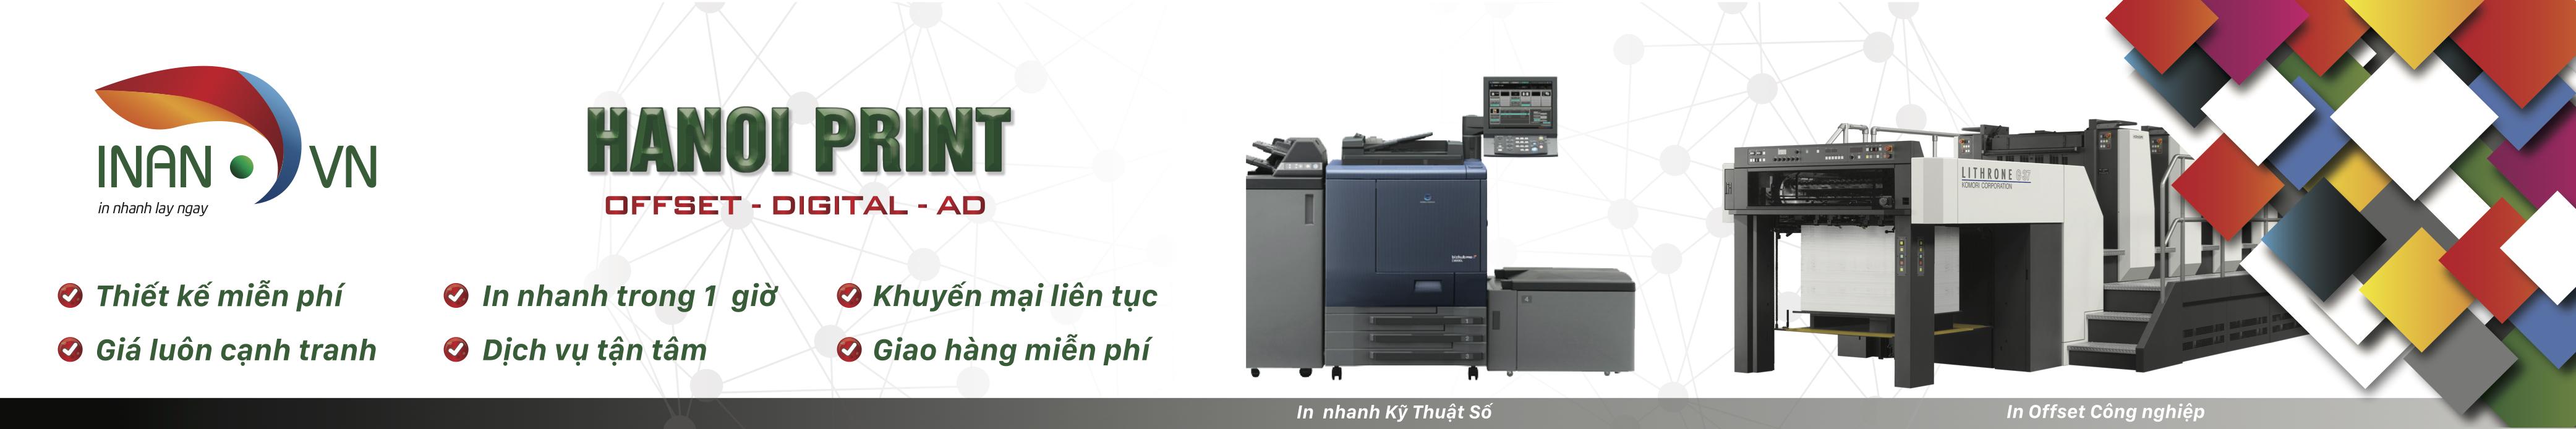 Hanoiprint - Inan.vn